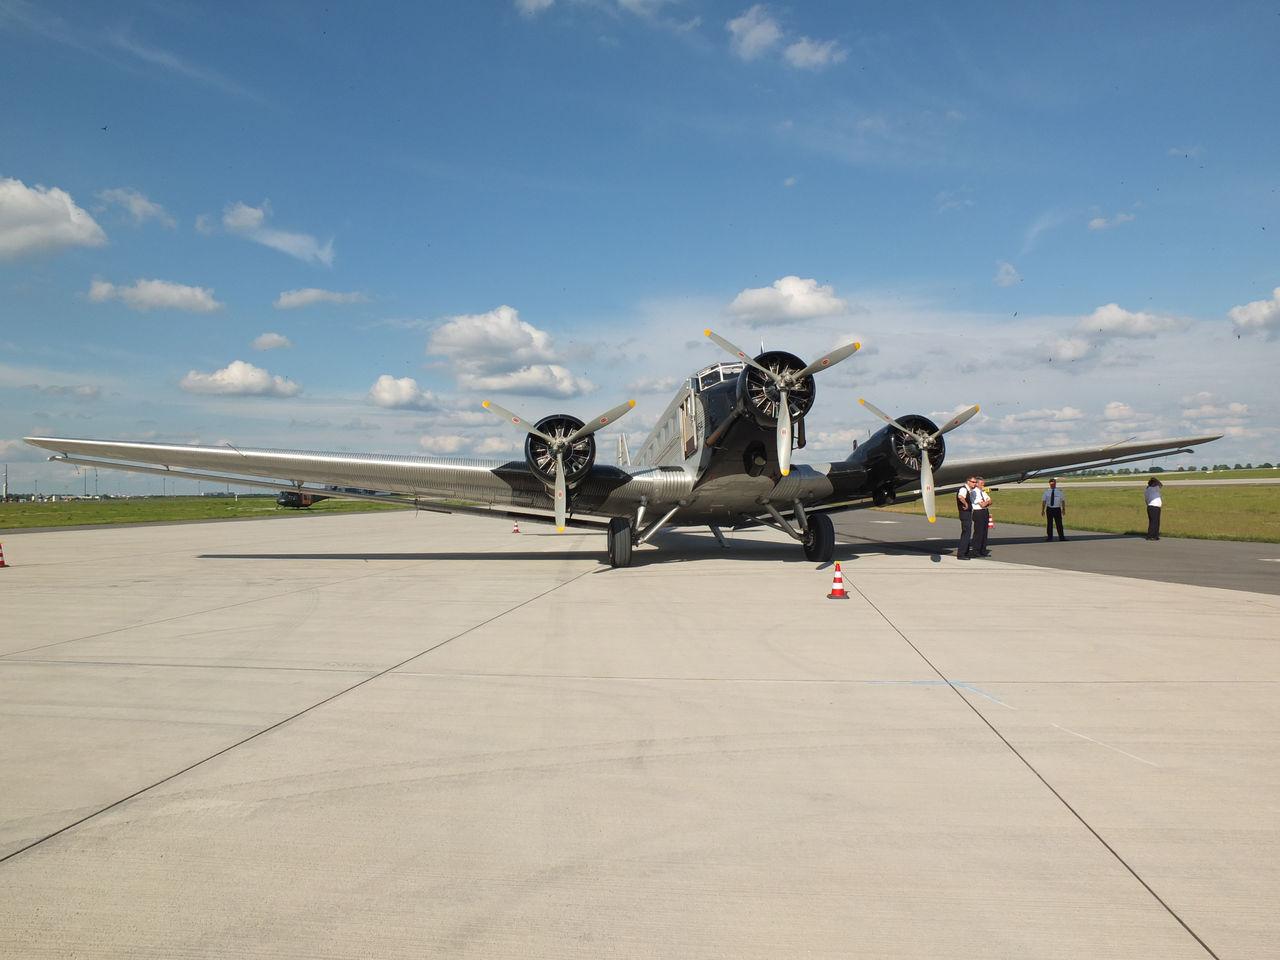 Самолет Junkers Ju-52 авиакомпании Lufthansa